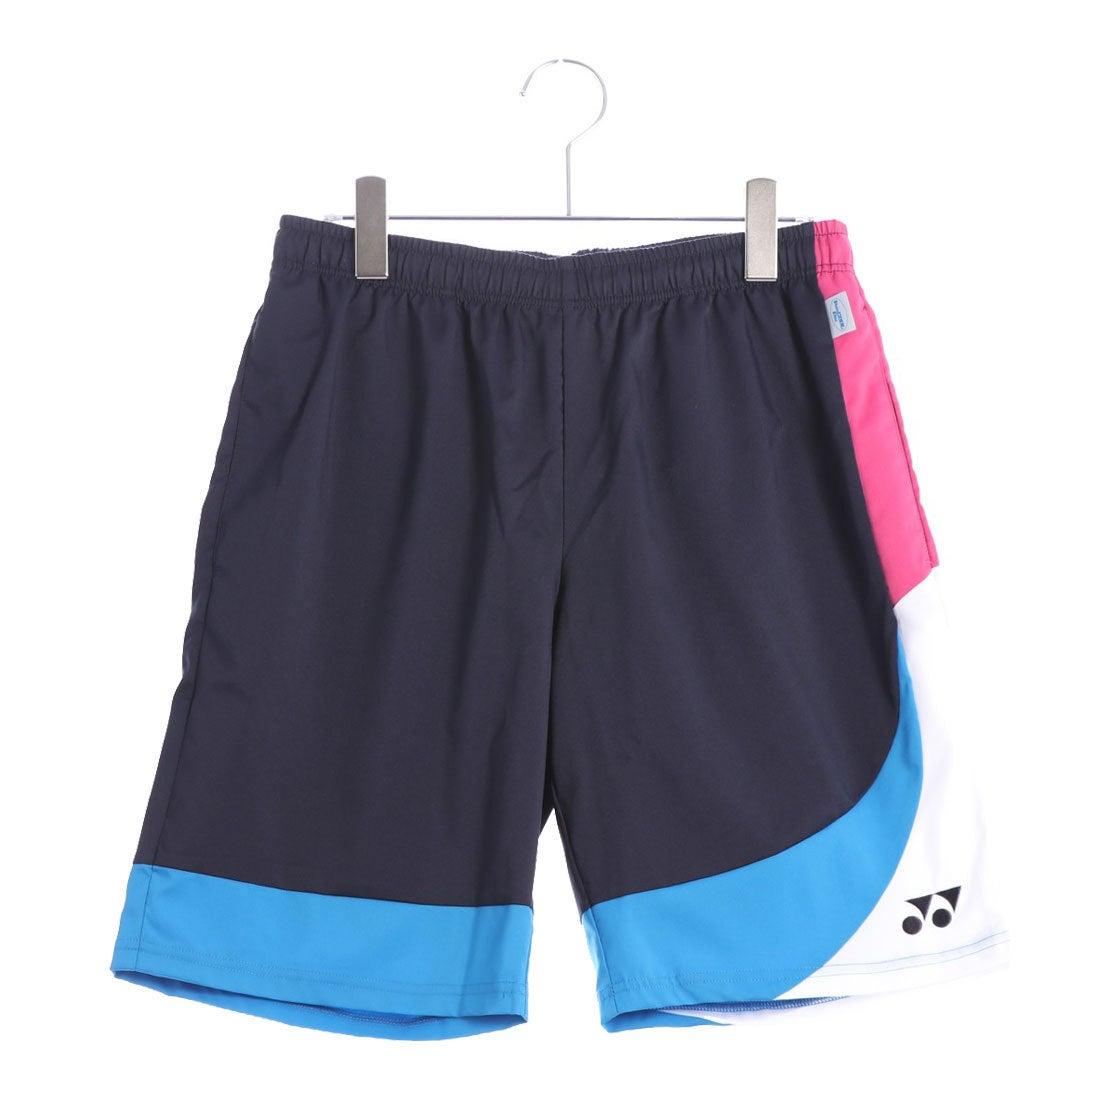 416e3a46bc925 ヨネックス YONEX ユニセックス テニス ハーフパンツ 15068 -レディースファッション通販 ロコンドガールズコレクション (ロココレ)